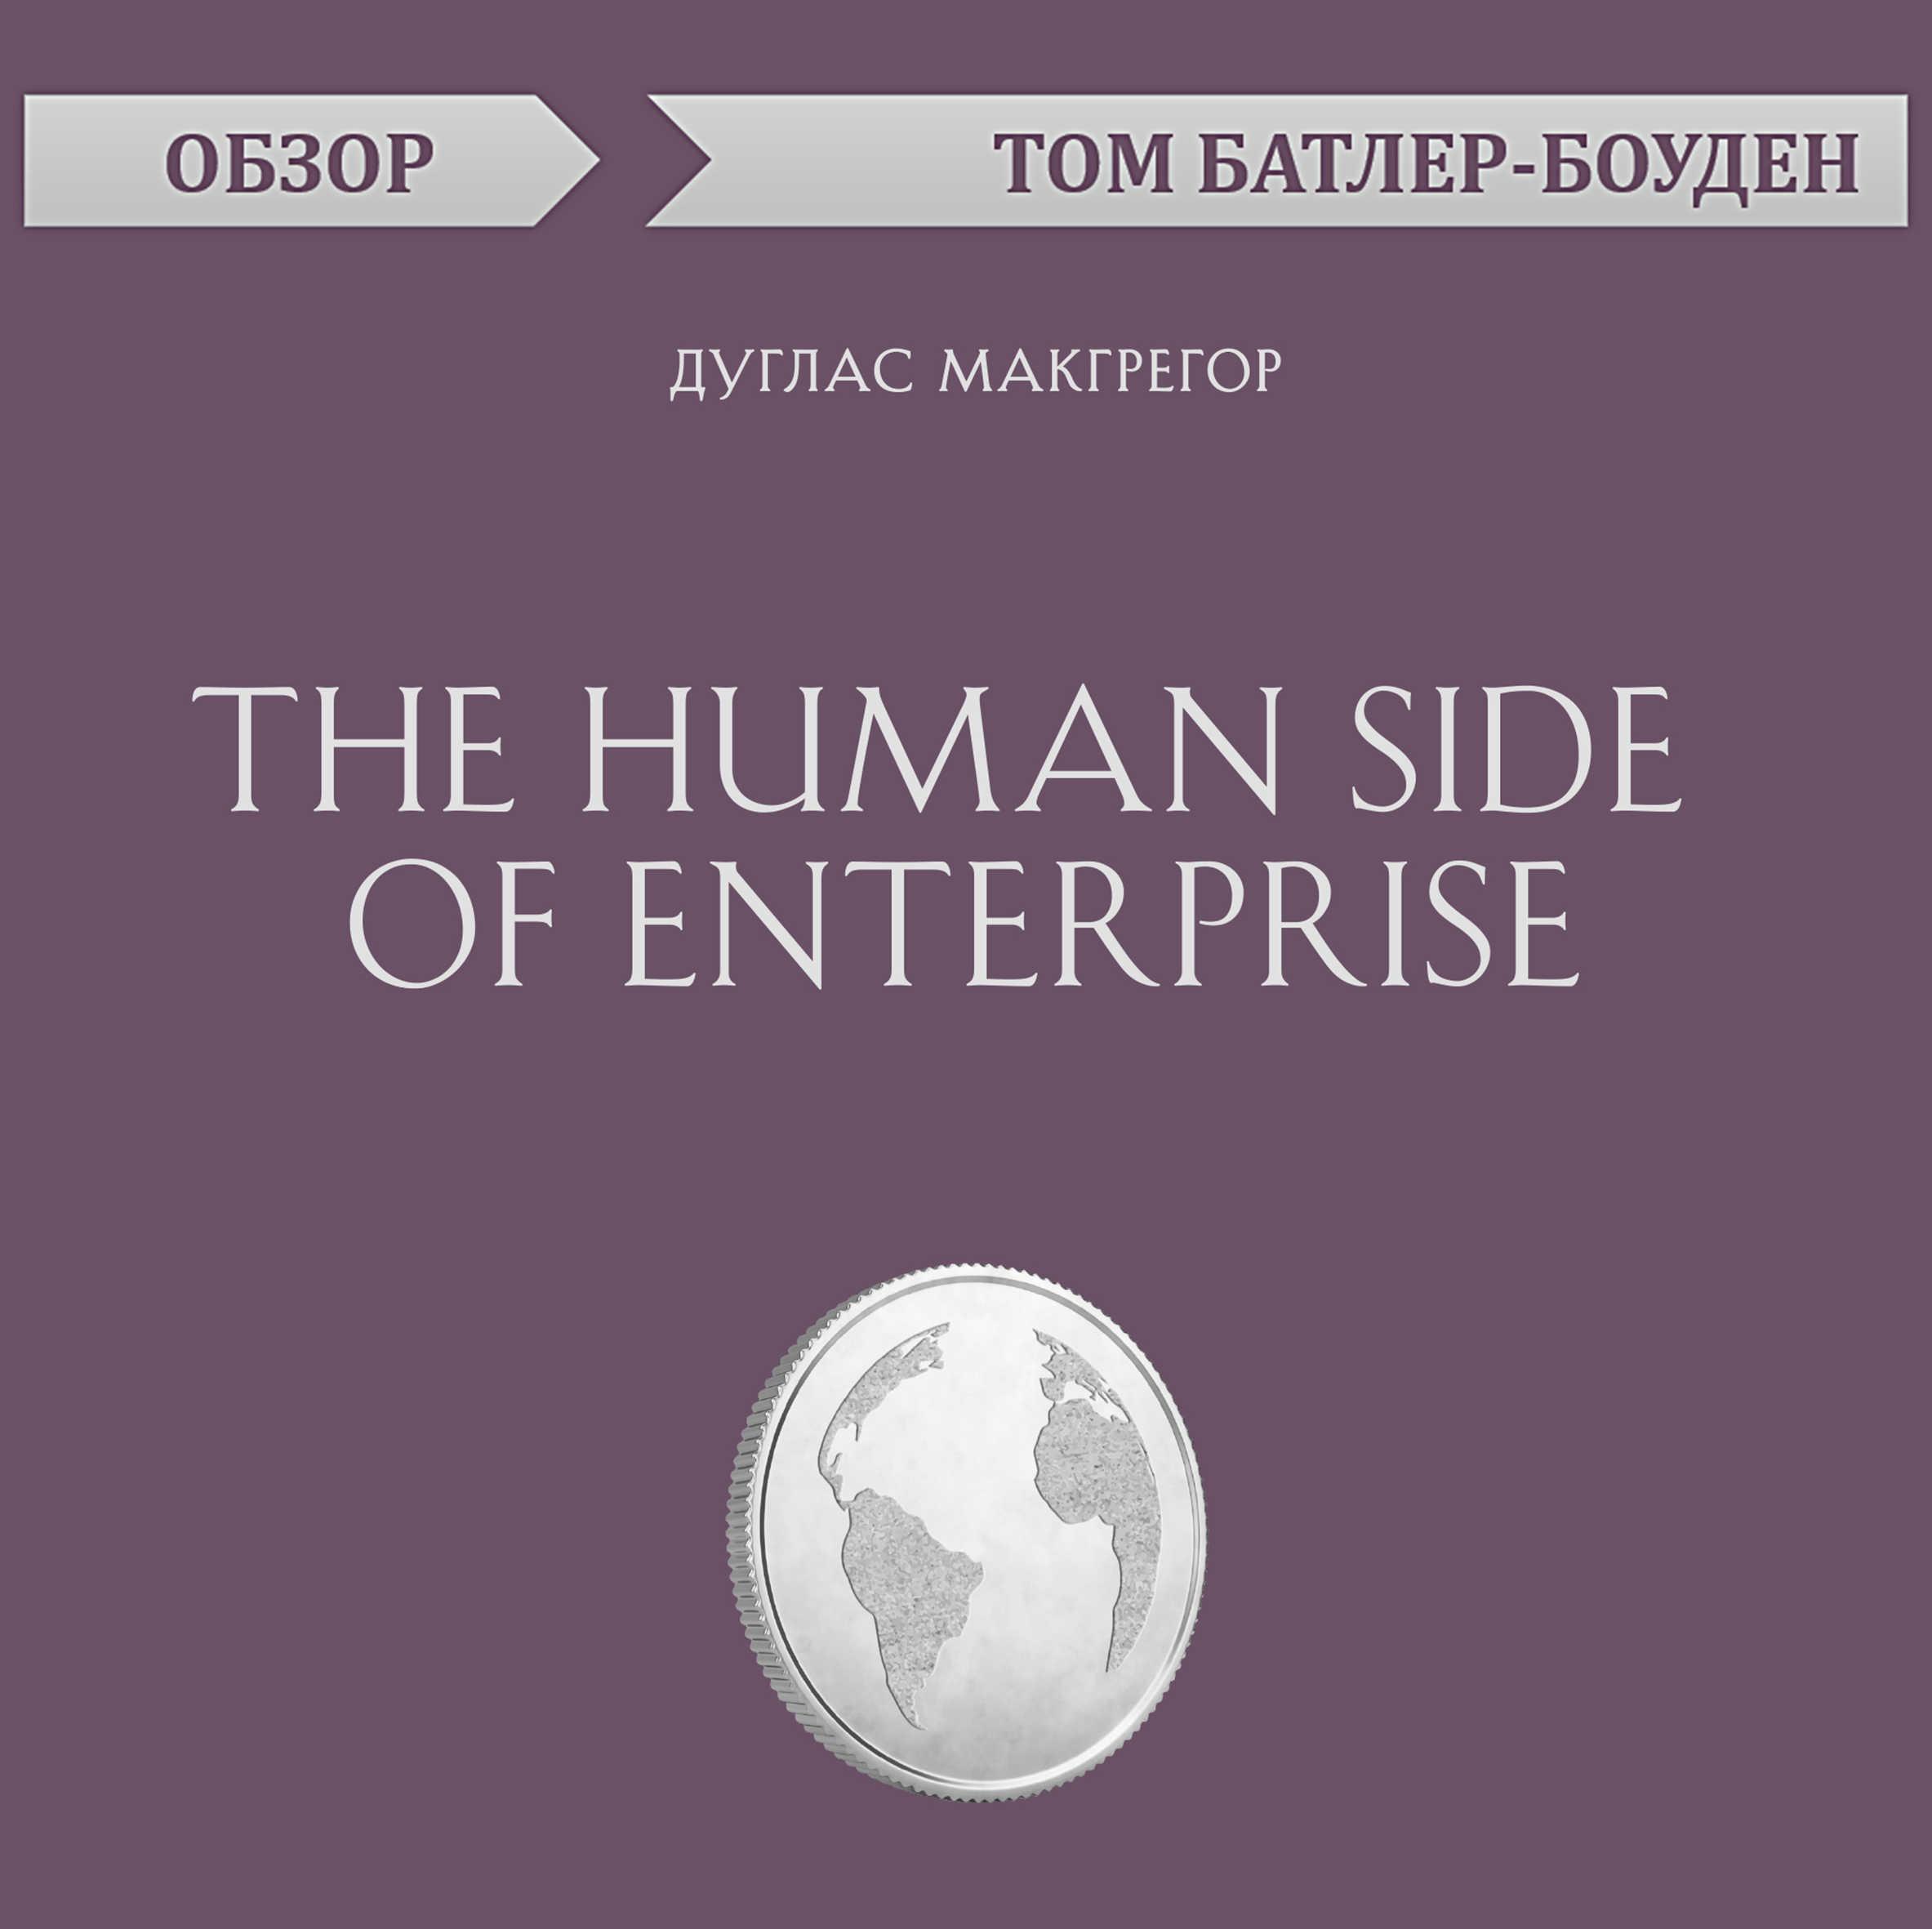 The Human Side of Enterprise. Дуглас Макгрегор (обзор)